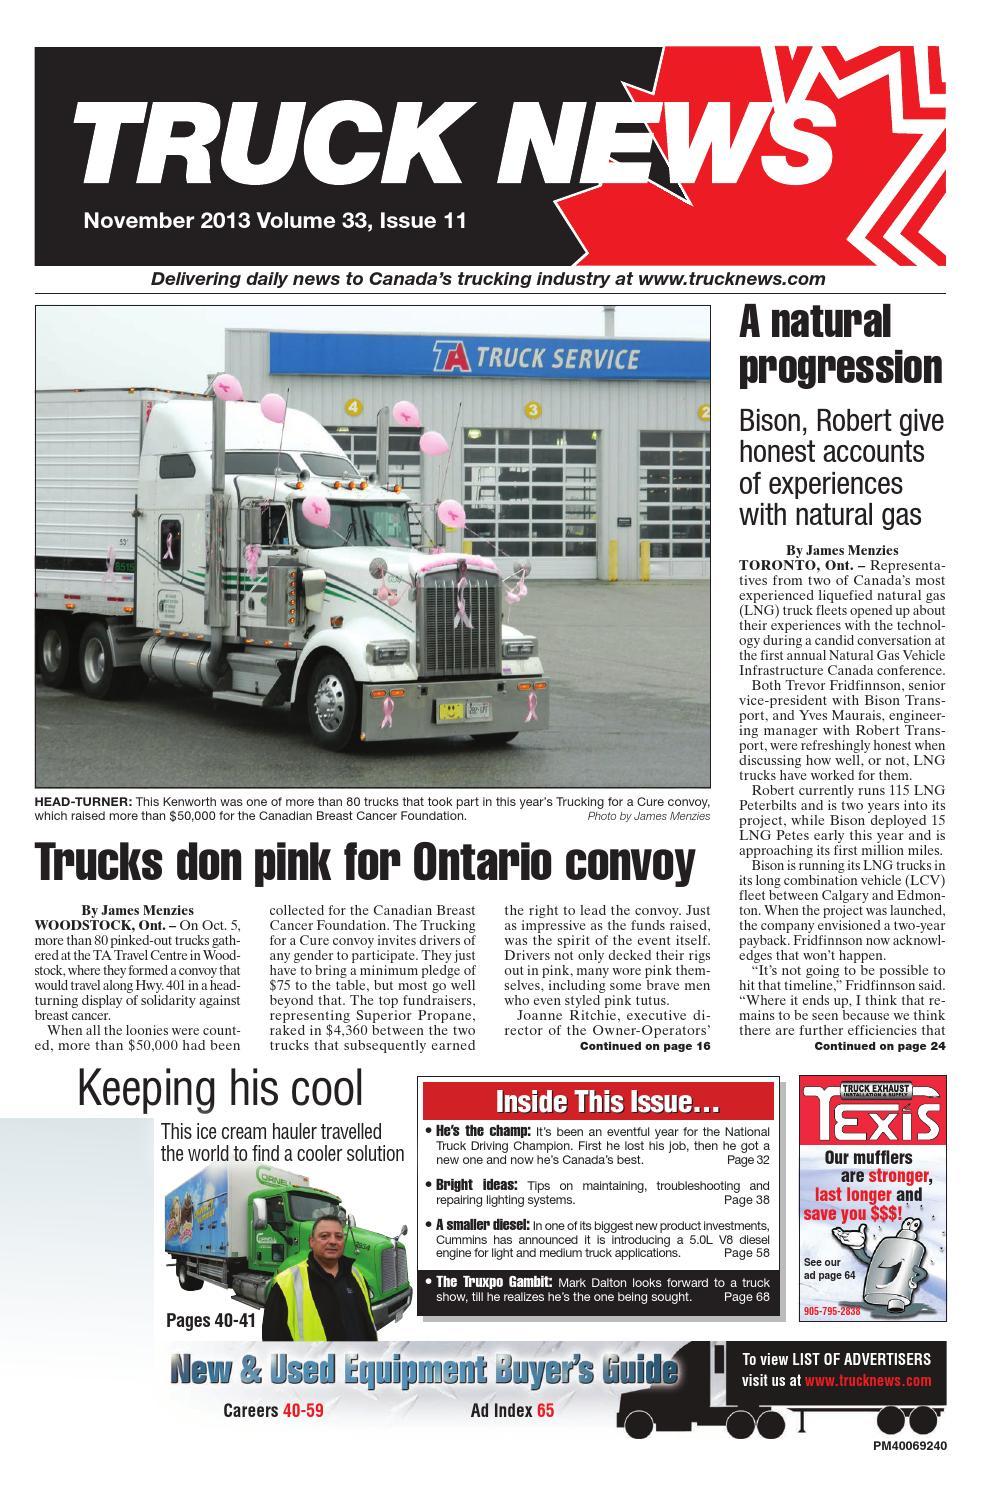 truck news november 2013 by annex newcom lp issuu